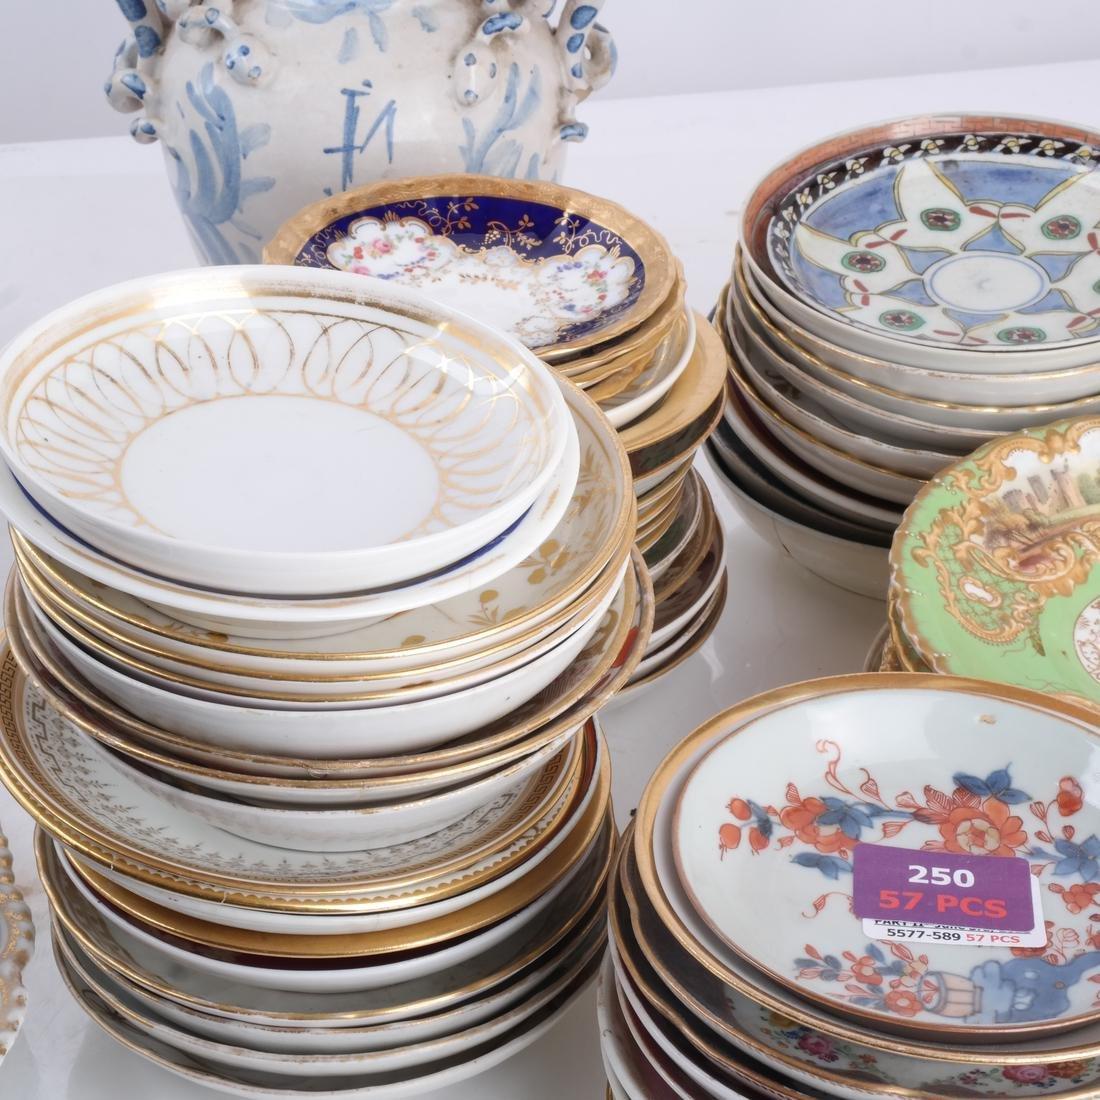 Assorted Porcelain Dessert/Dinnerware - 3